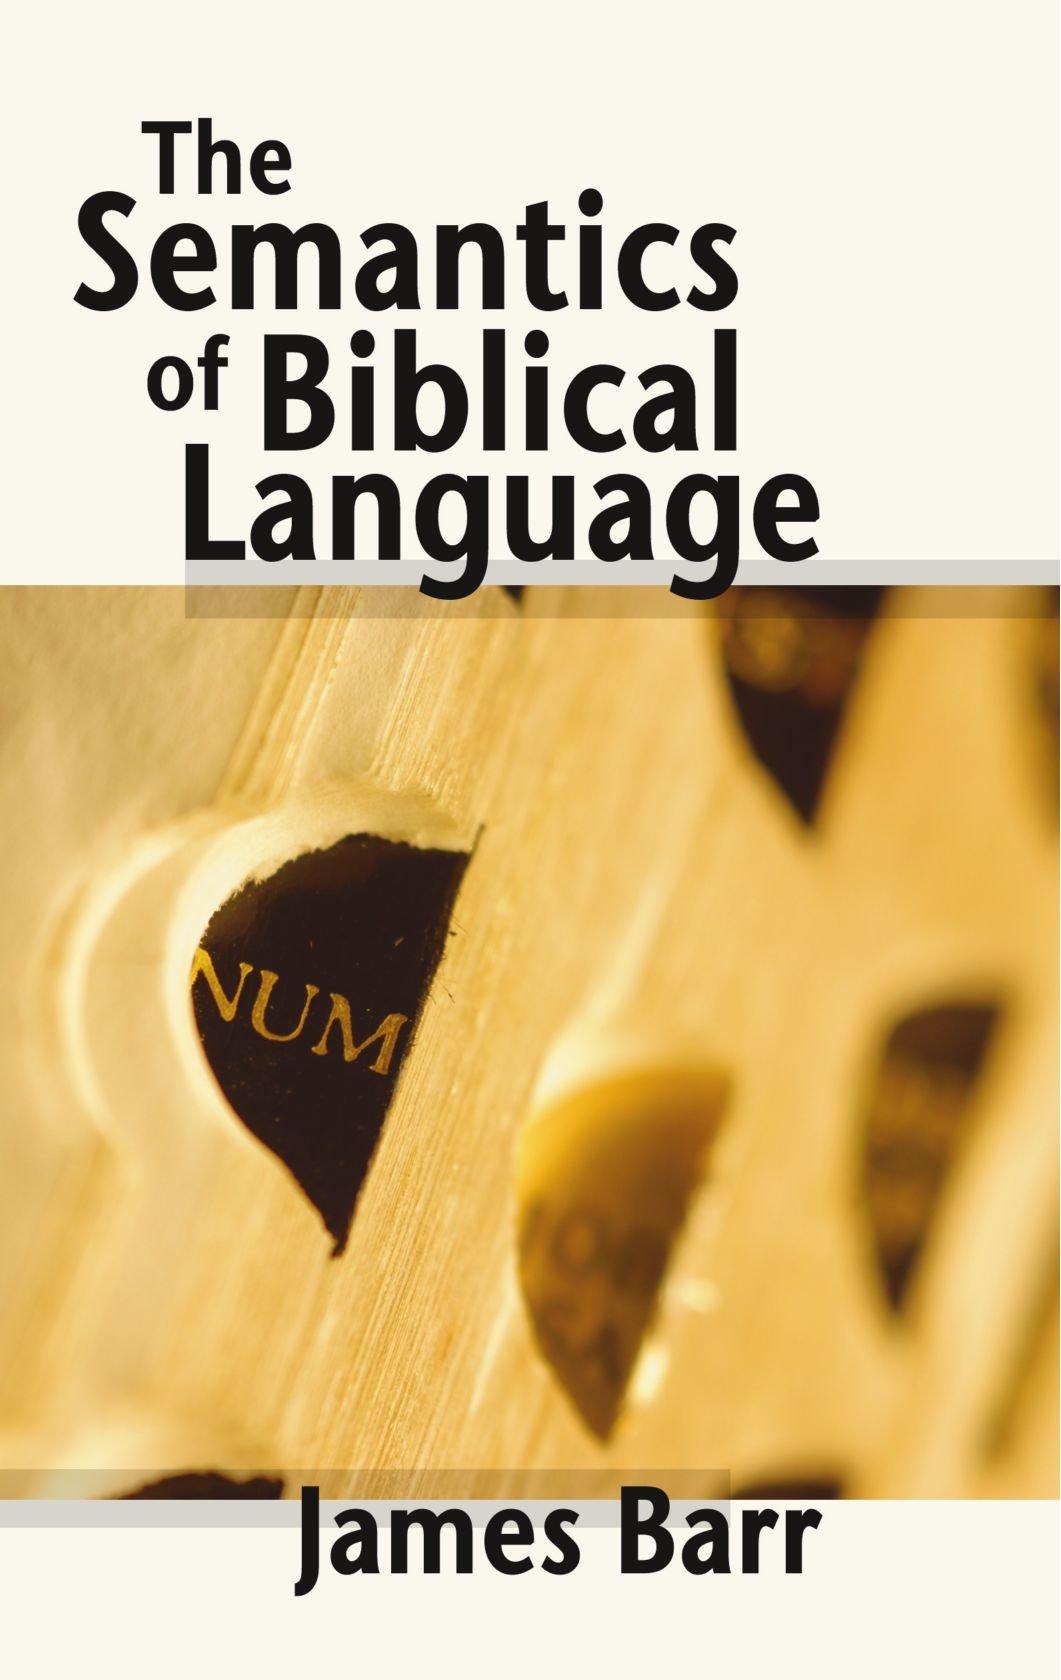 The Semantics of Biblical Language: